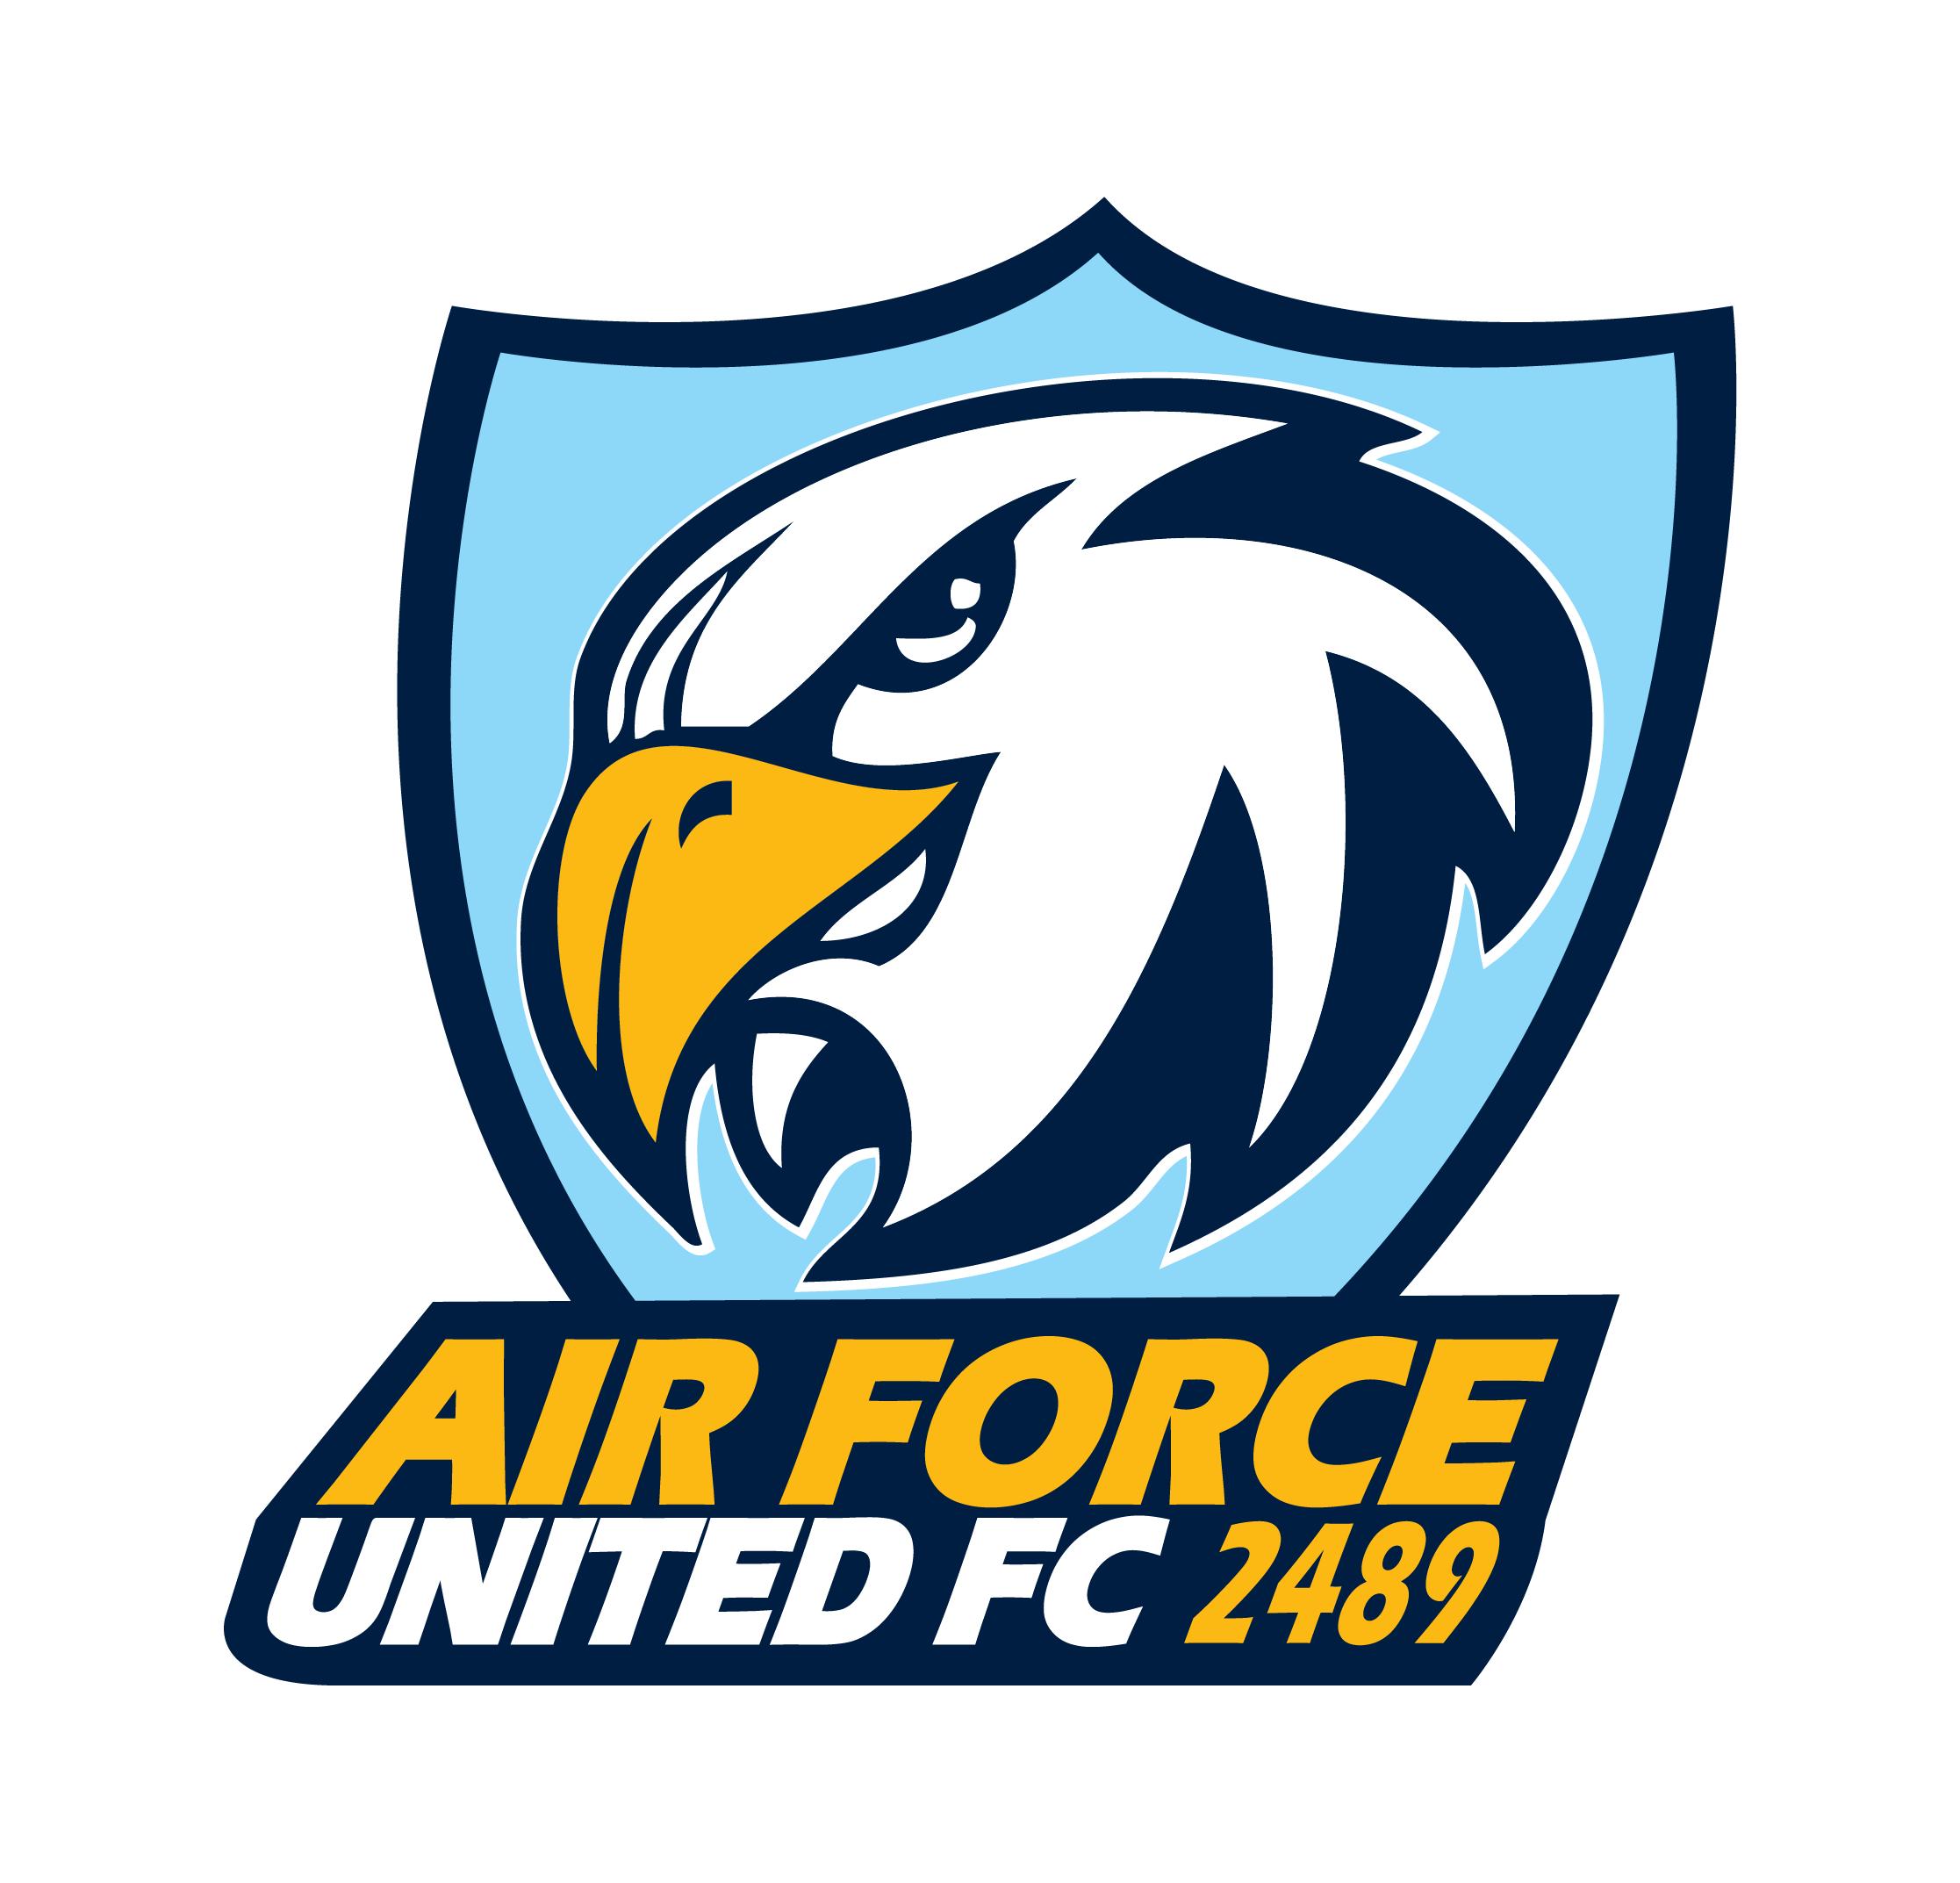 Airforce united B